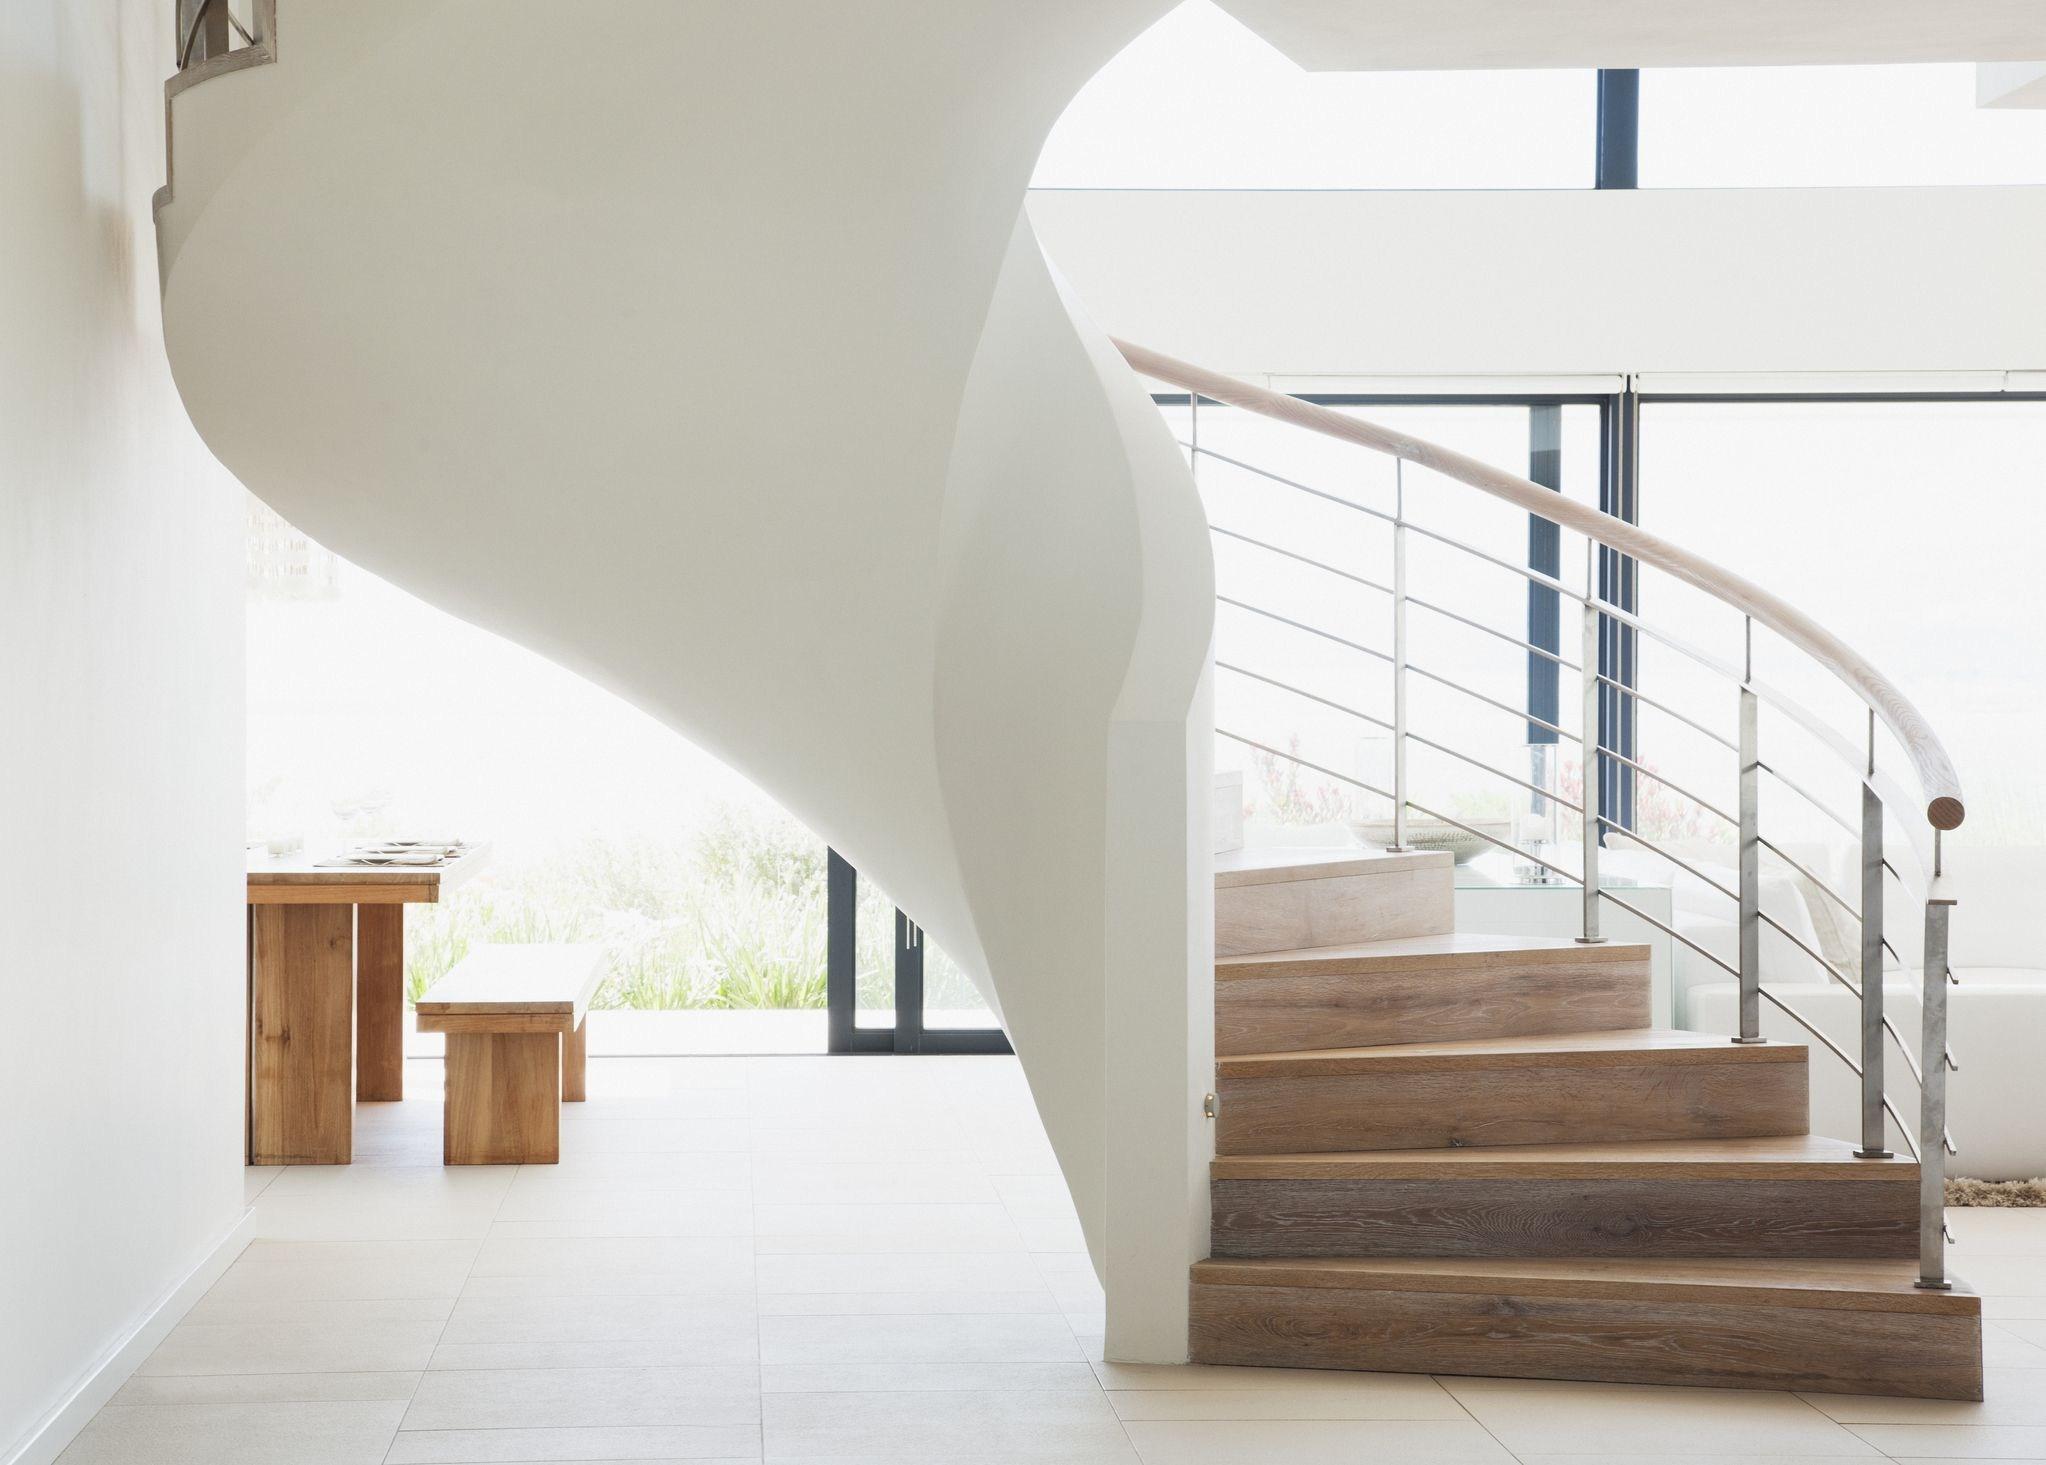 Interior Staircase Design Ideas Repairing Replacing Or Repositioning | Stair Design For Seniors | World's | Contemporary | Steel | Unique | Indoor